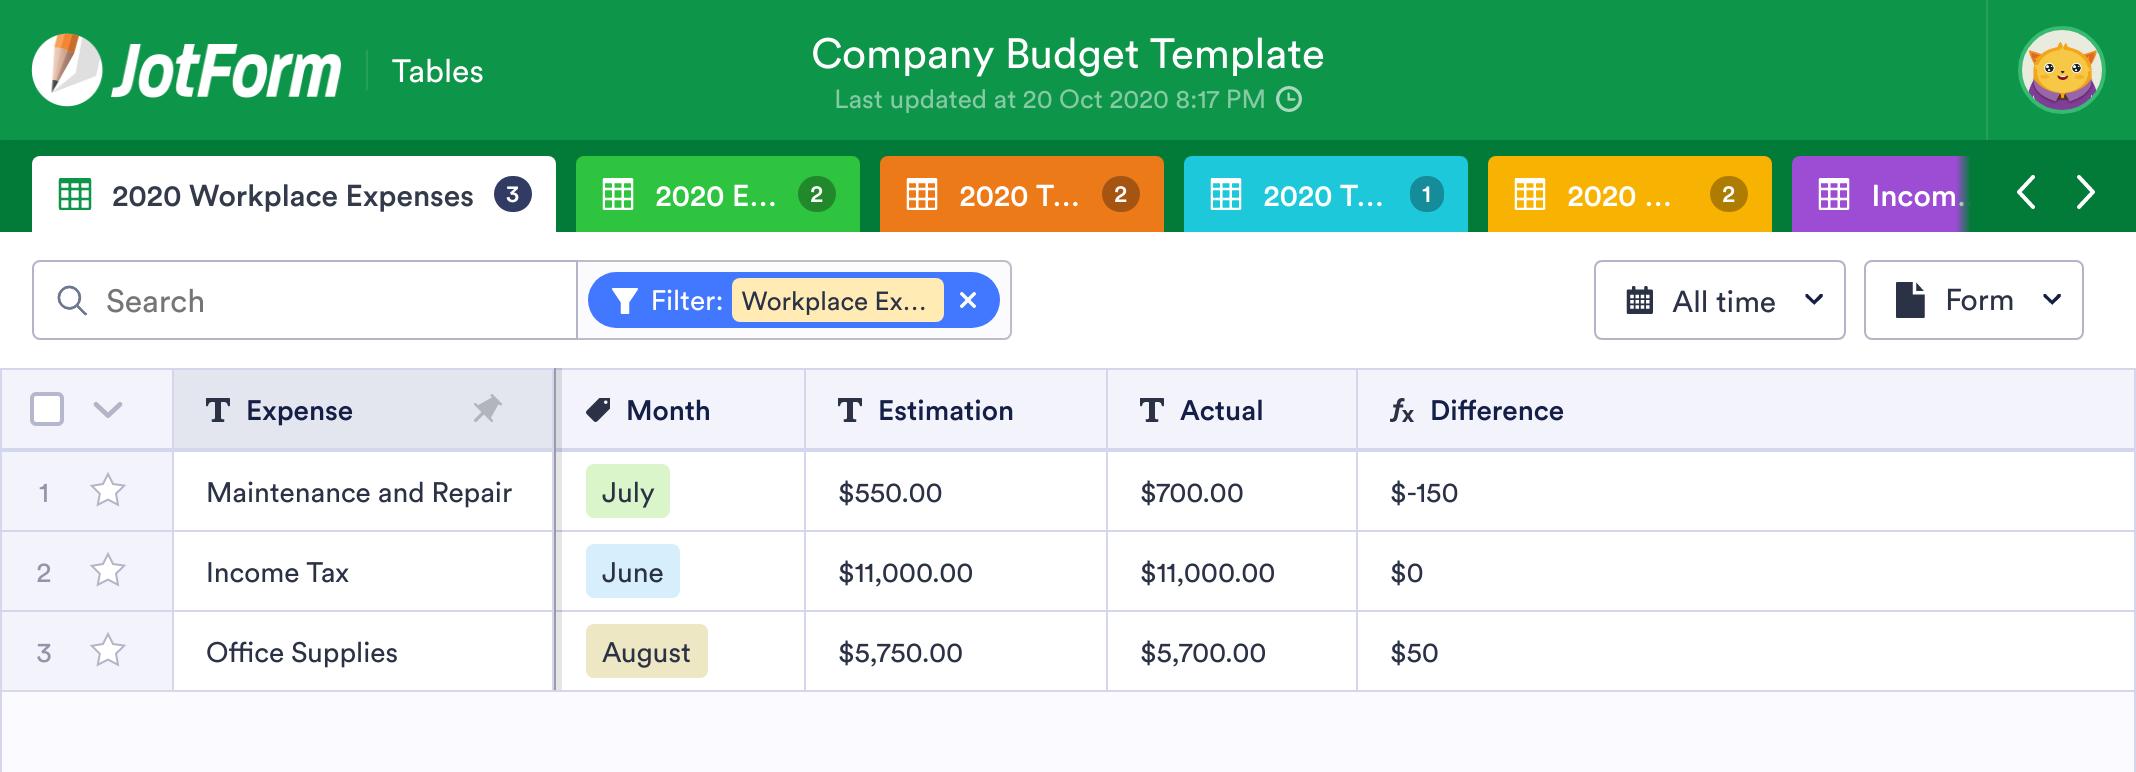 Company Budget Template